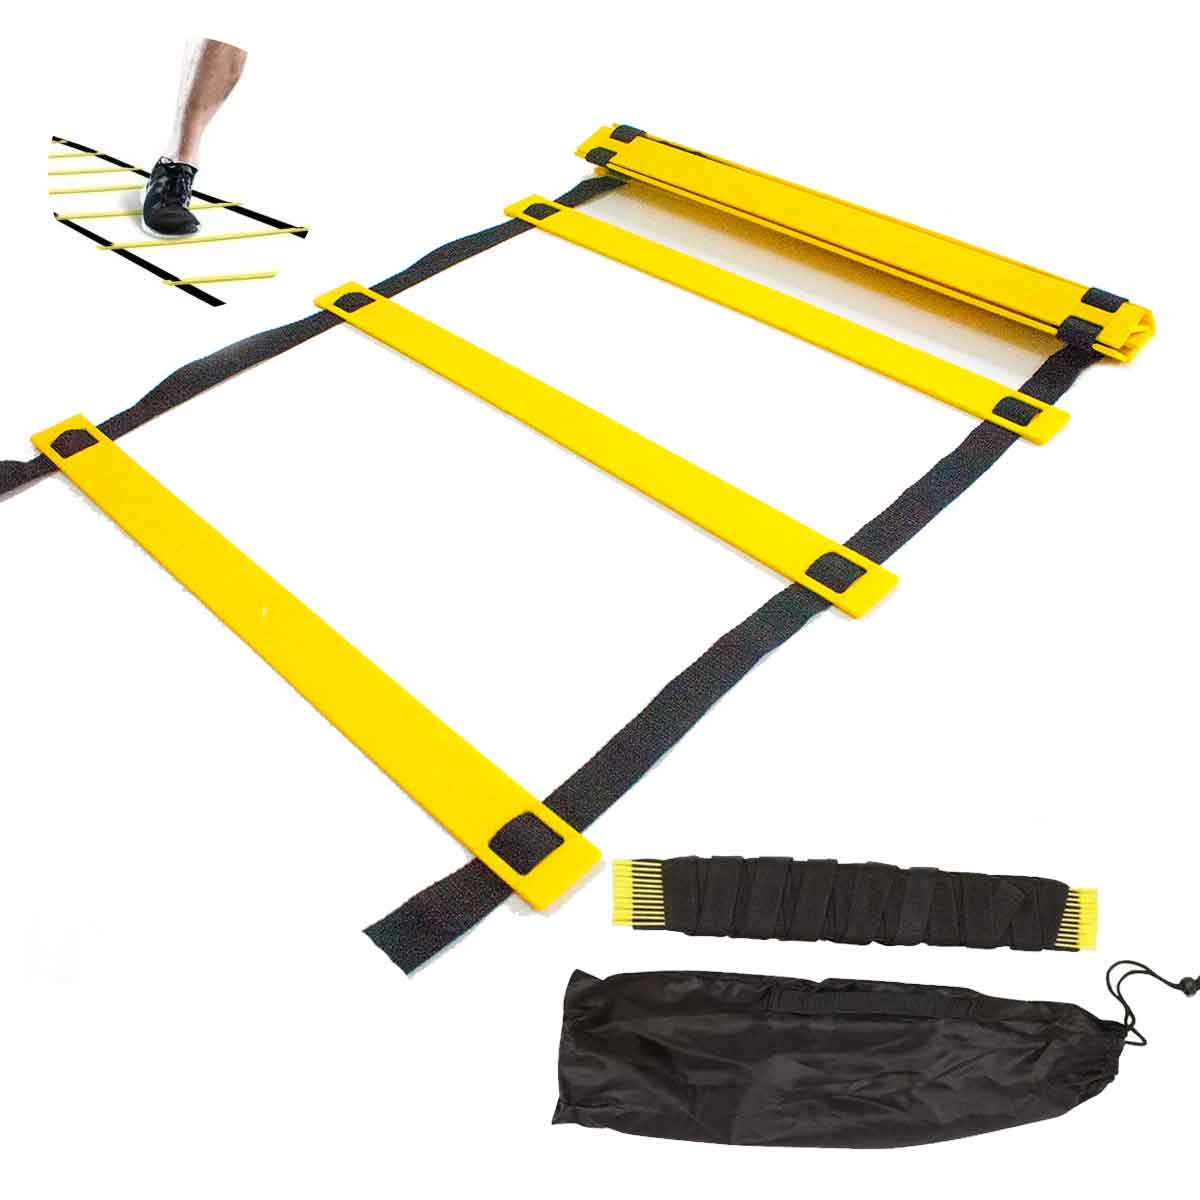 Escada De Agilidade Treino Funcional 10 Degraus 5m Esporte